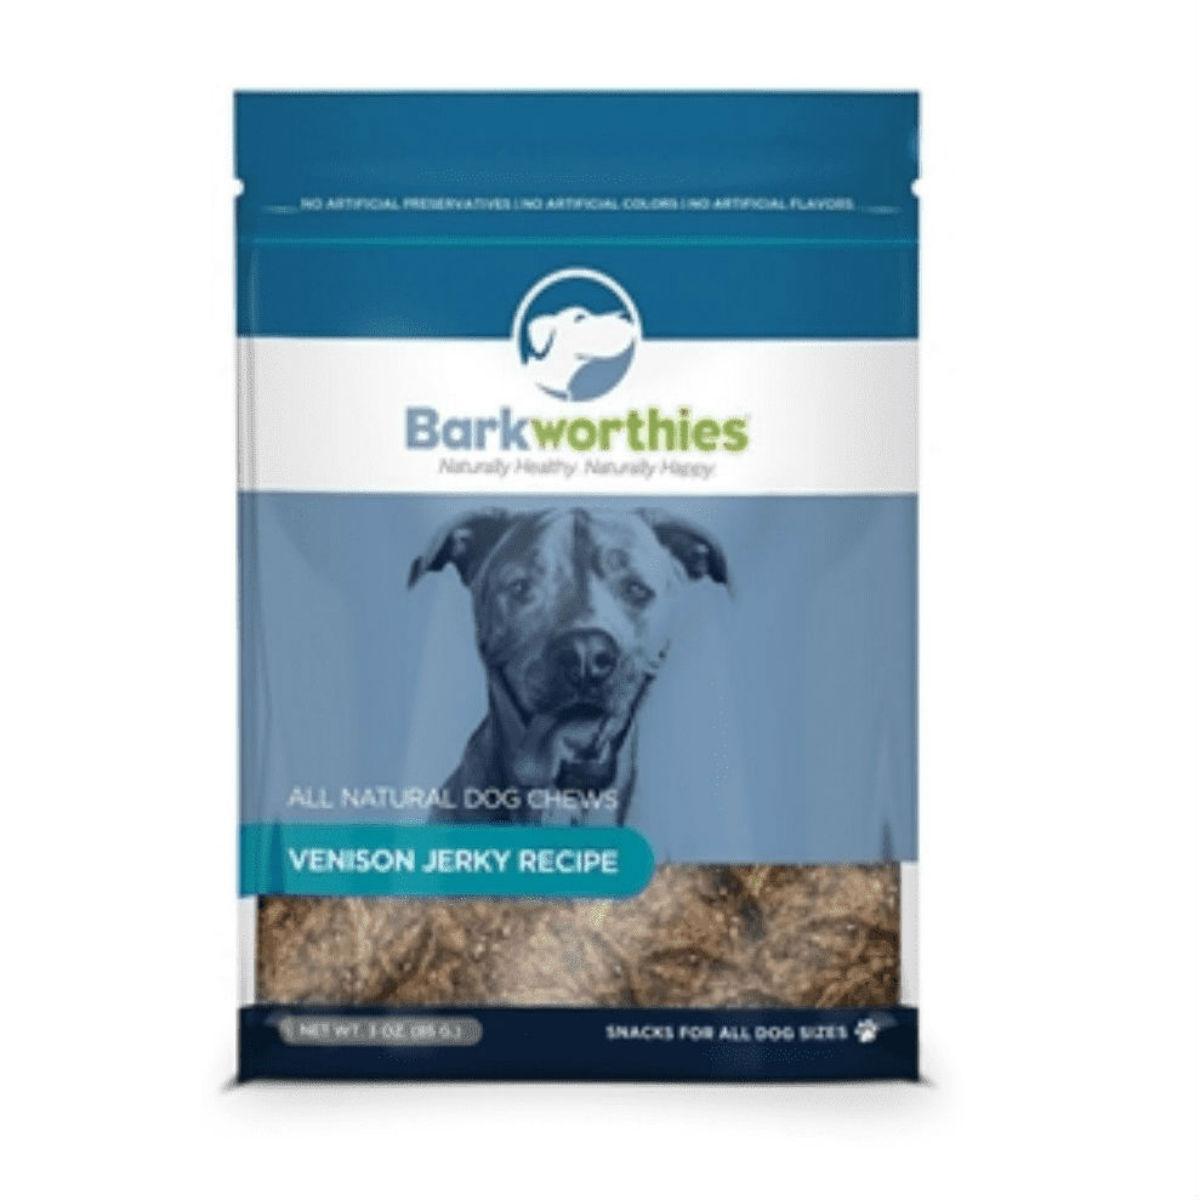 Barkworthies Venison Jerky Dog Treats